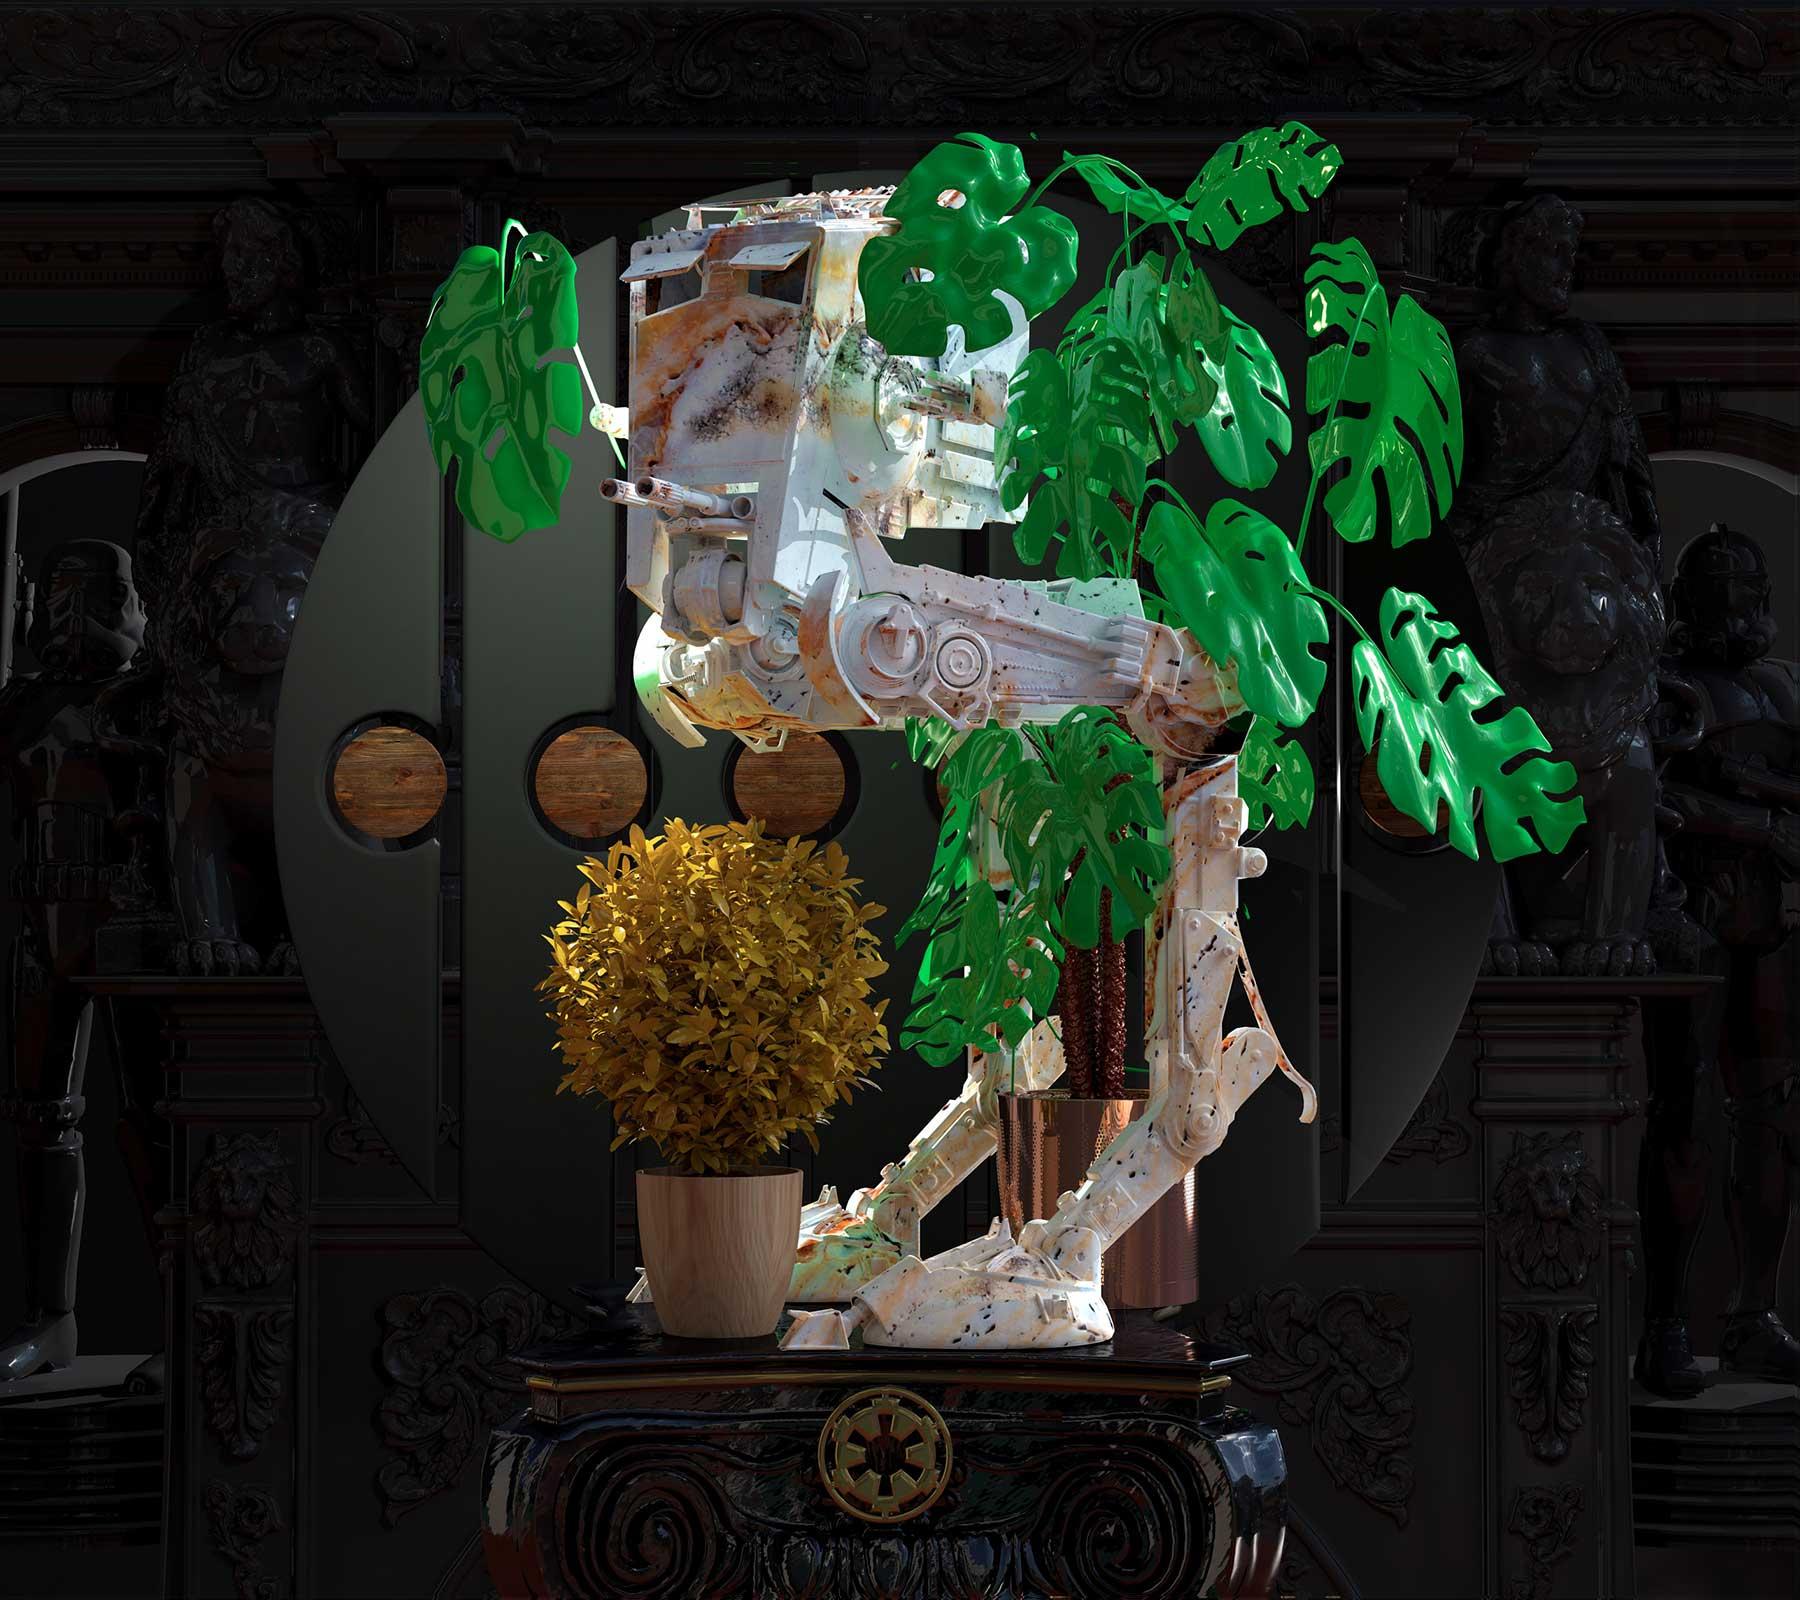 Star Wars, Ngon, Jodie Rudge, 3d design, cgi, bespoke branding, Manchester 3D Artist Visualisation